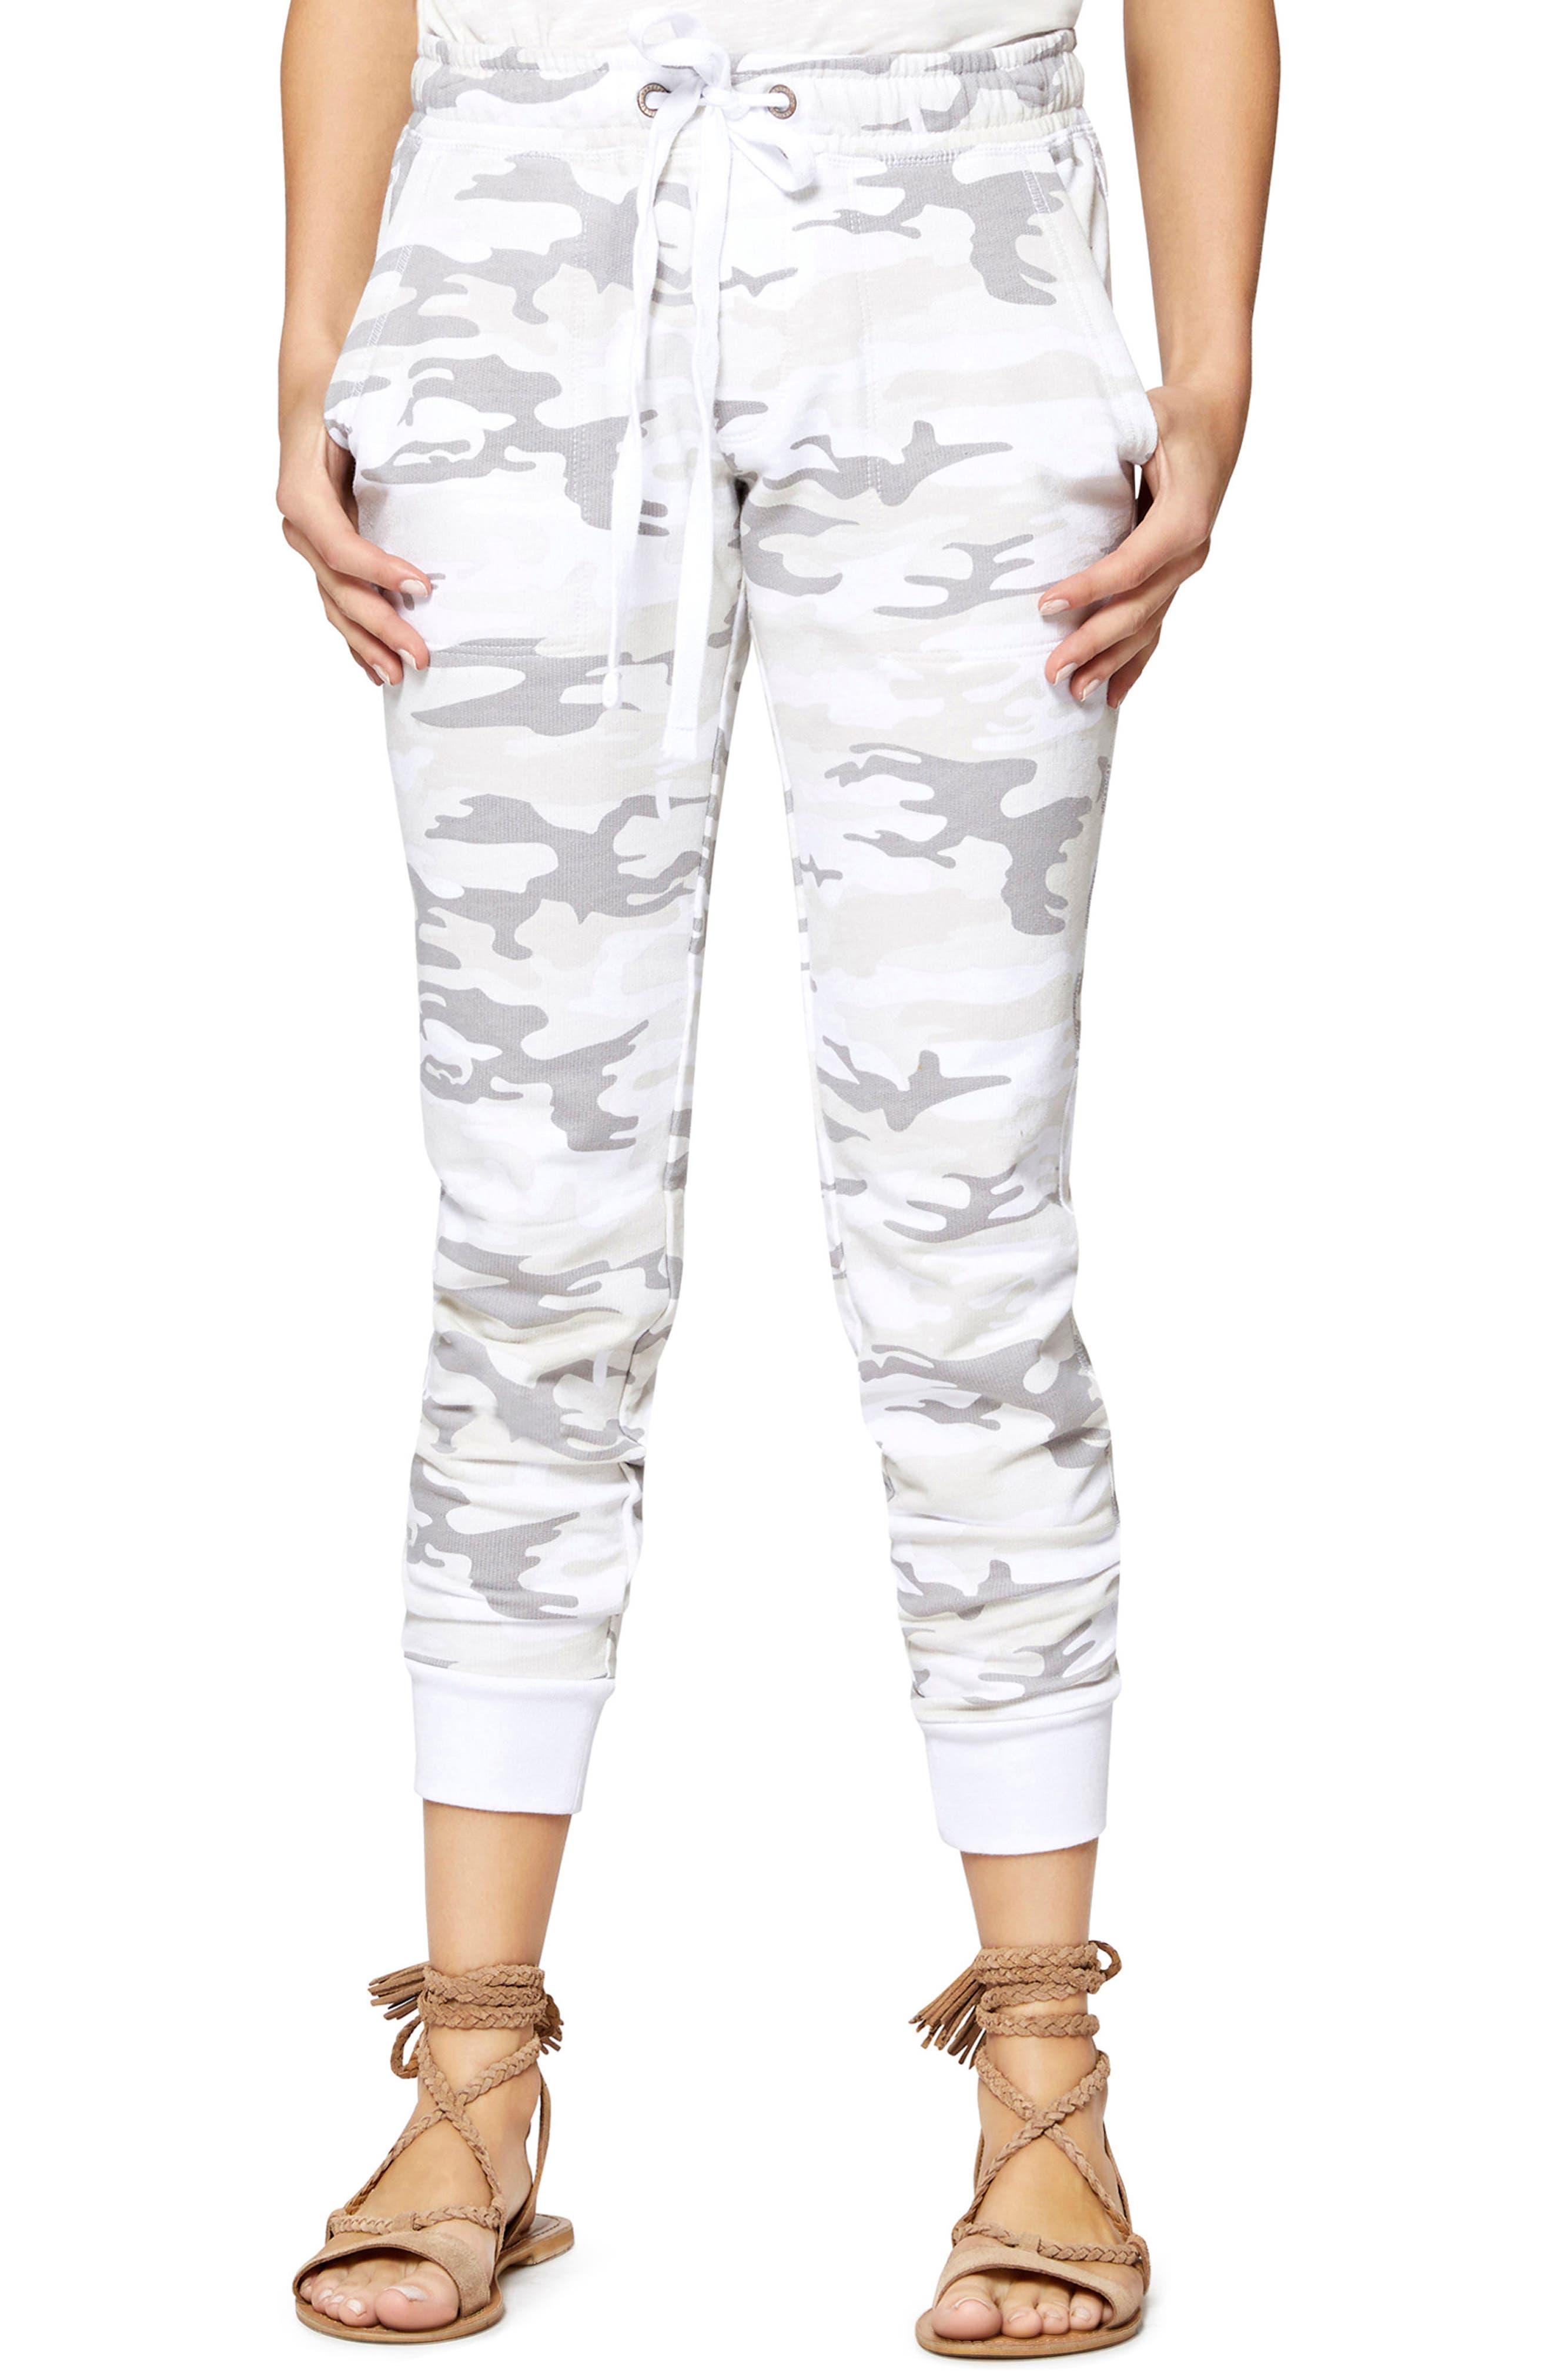 Peace Brigade Jogger Pants,                         Main,                         color, White Camo